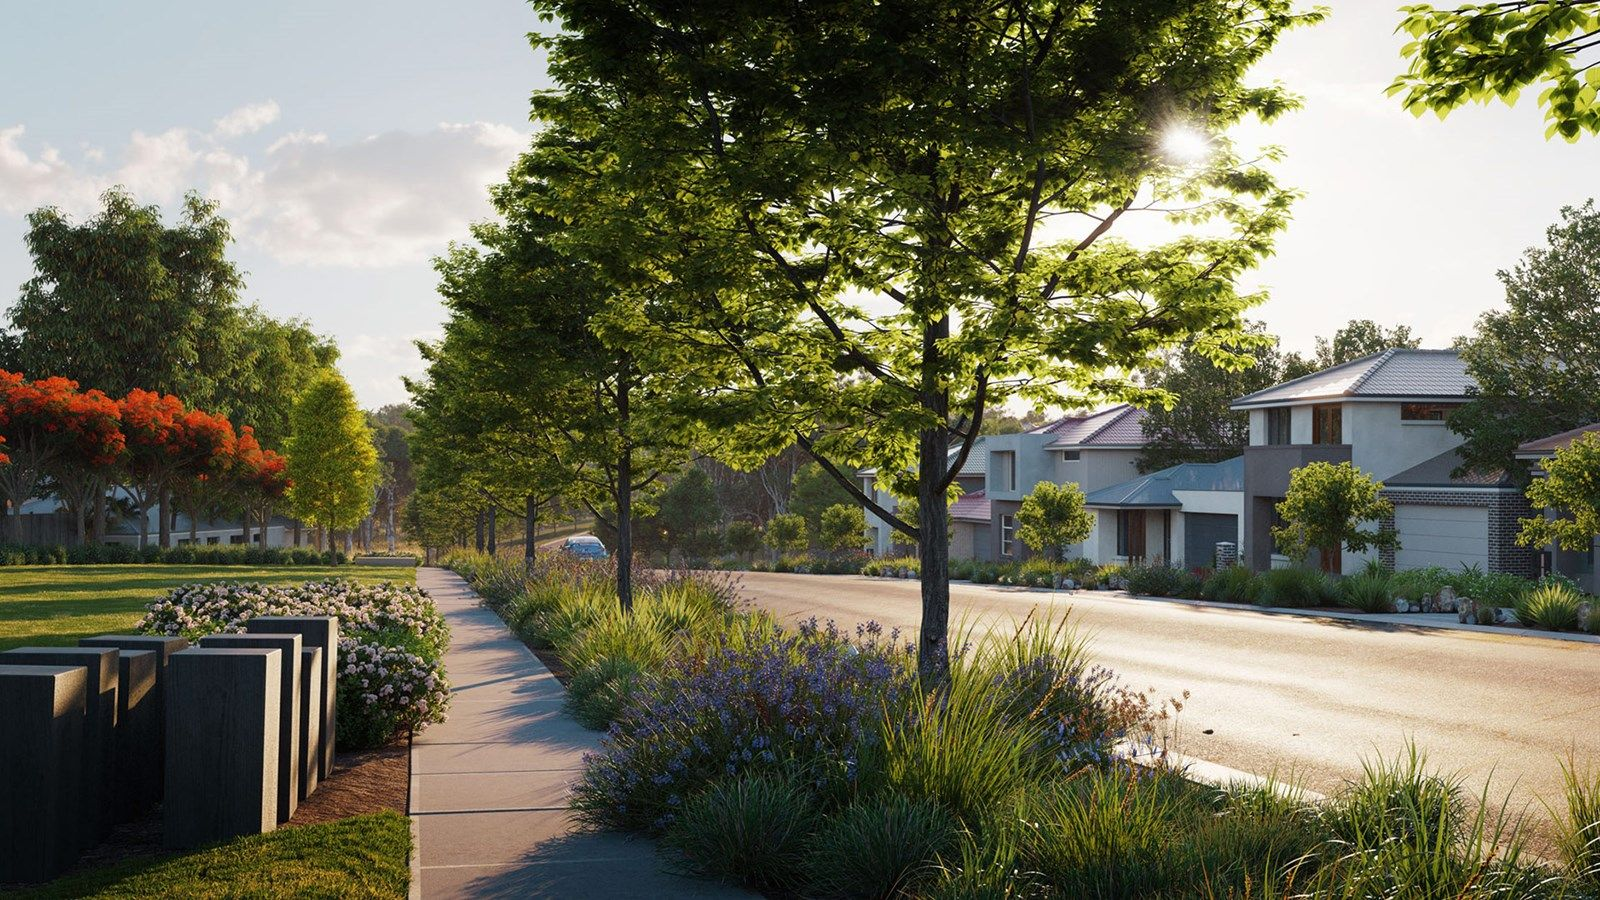 352 Ripley Road, Ripley, QLD 4306, Image 0